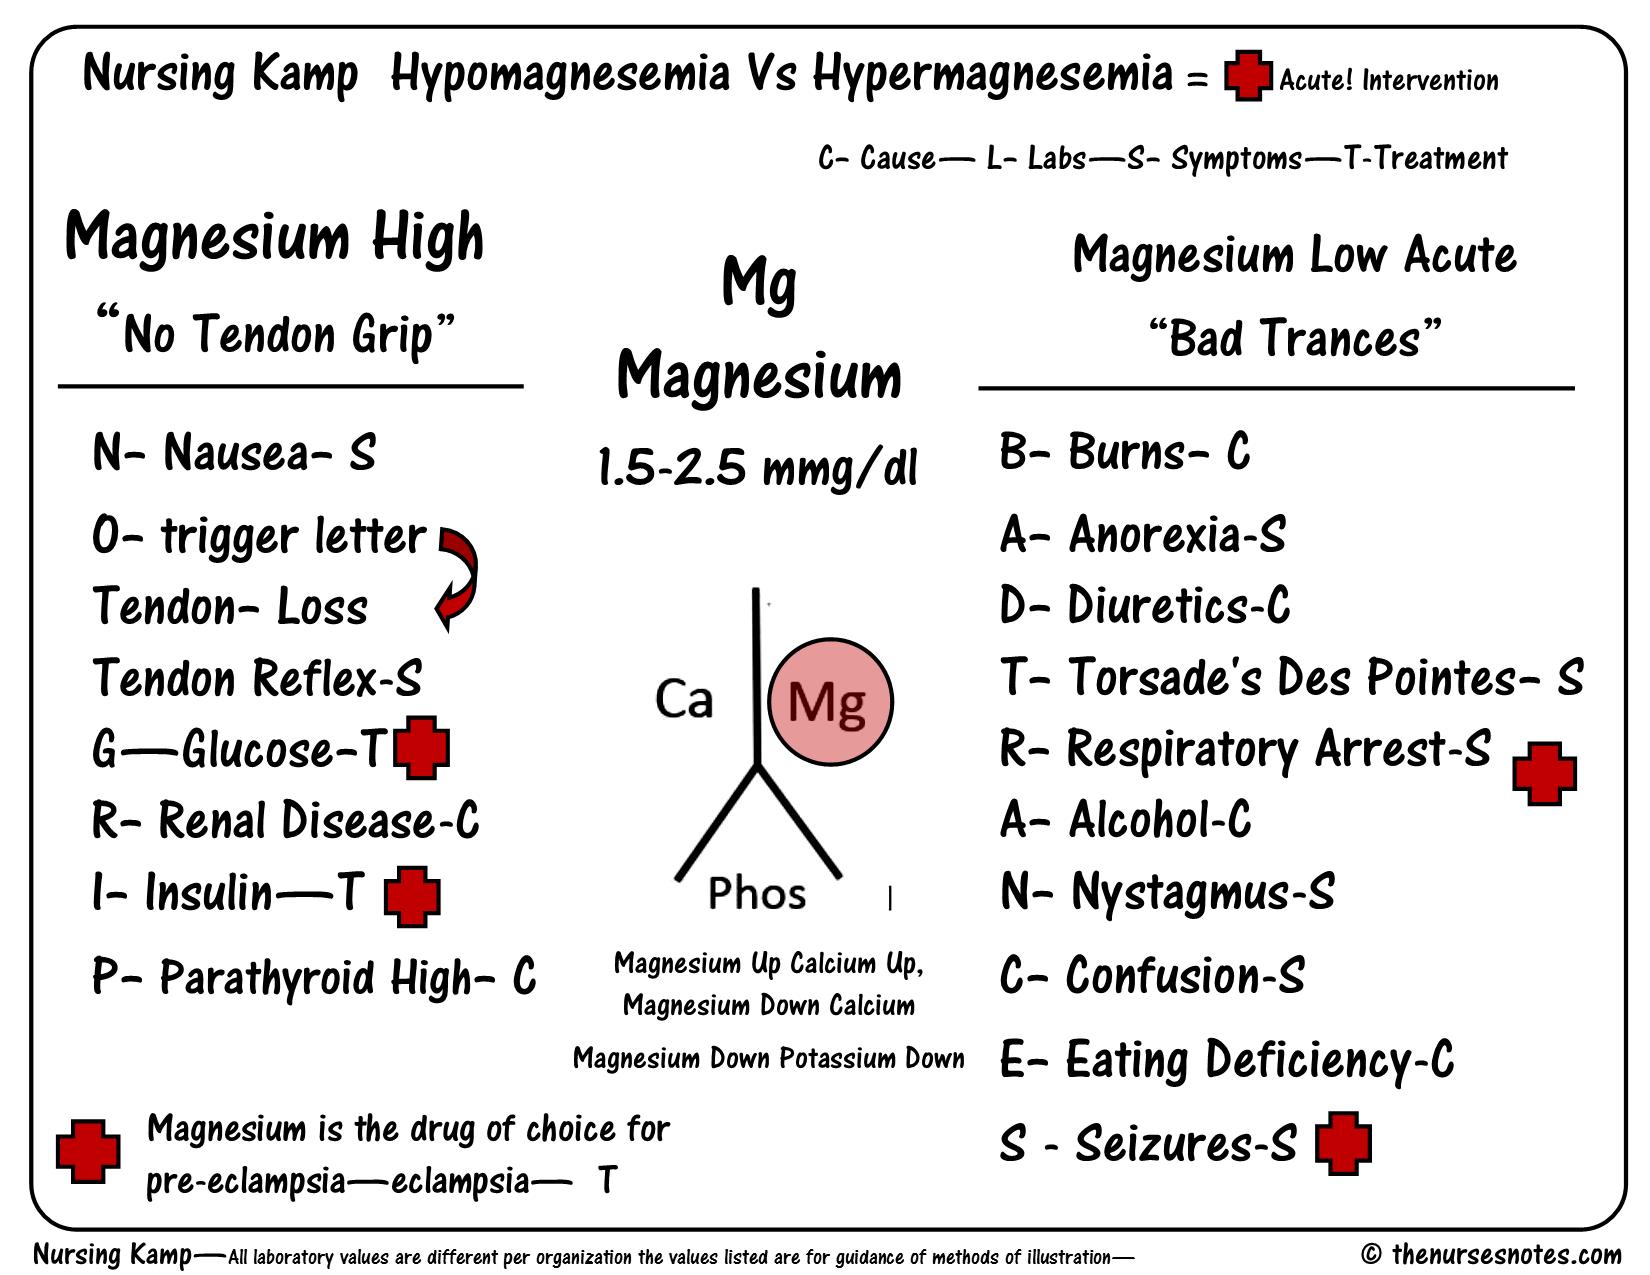 Hypomagnesemia Vs Hypermagnesemia